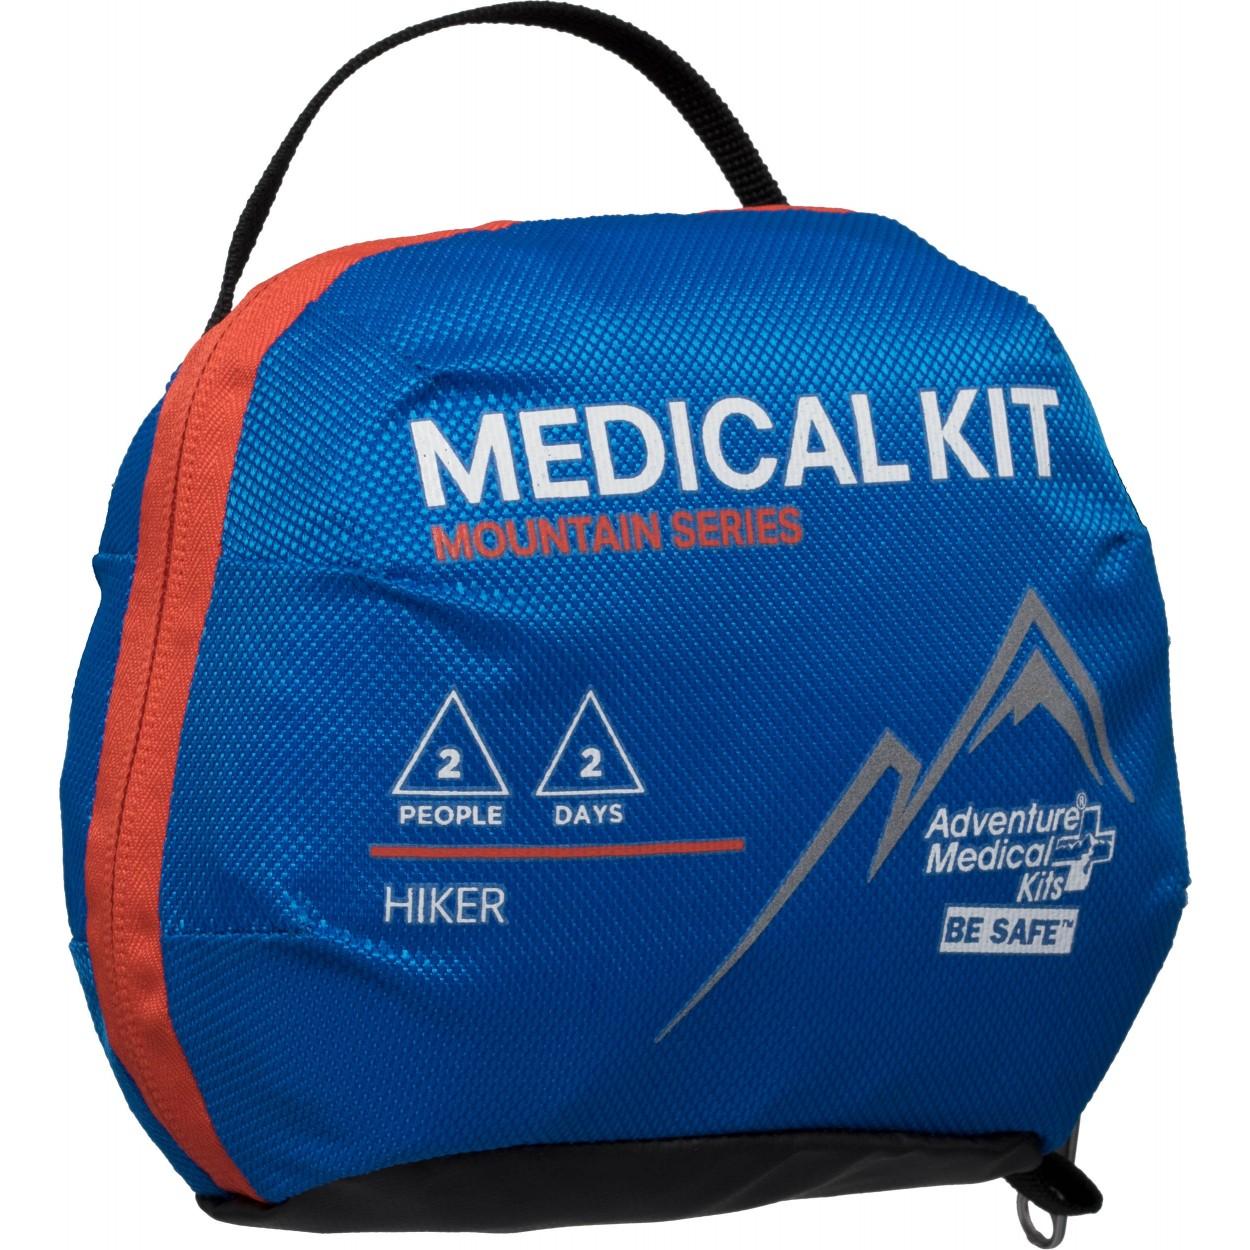 Mountain Hiker Medical Kit Adventure Medical Kits